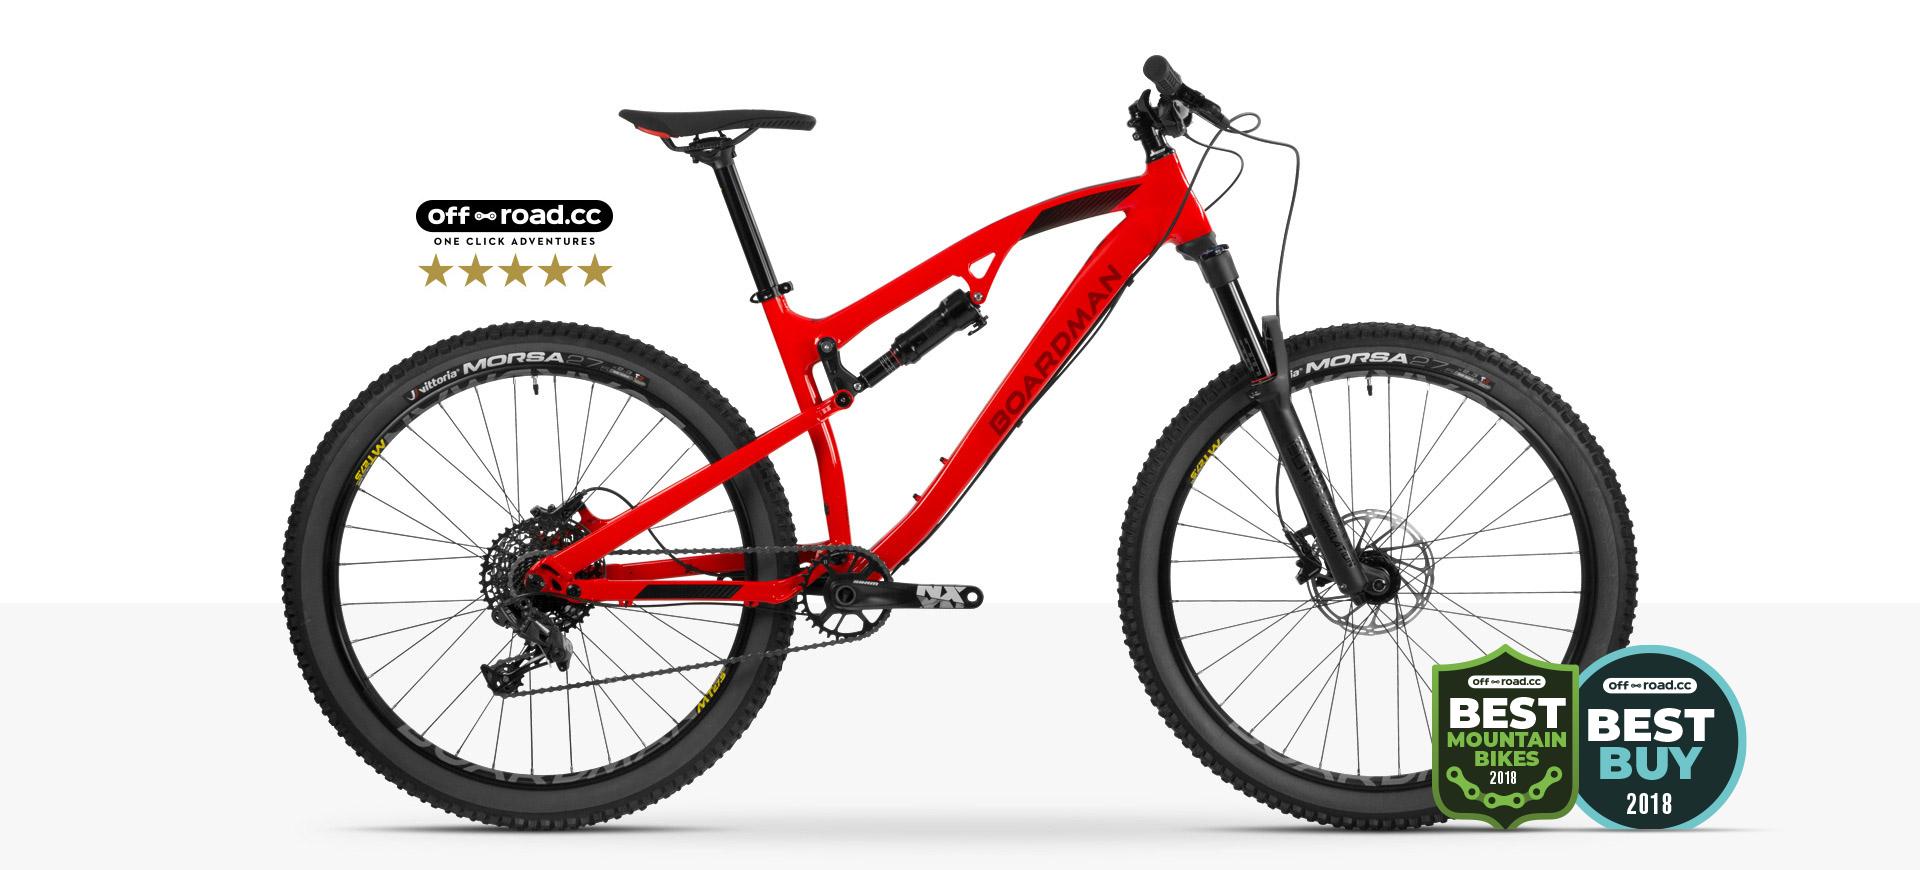 aeaefeb9a9f MTR 8.9. $0.00 Purchase Here. Boardman MTR 8.9 Mountain Bike ...